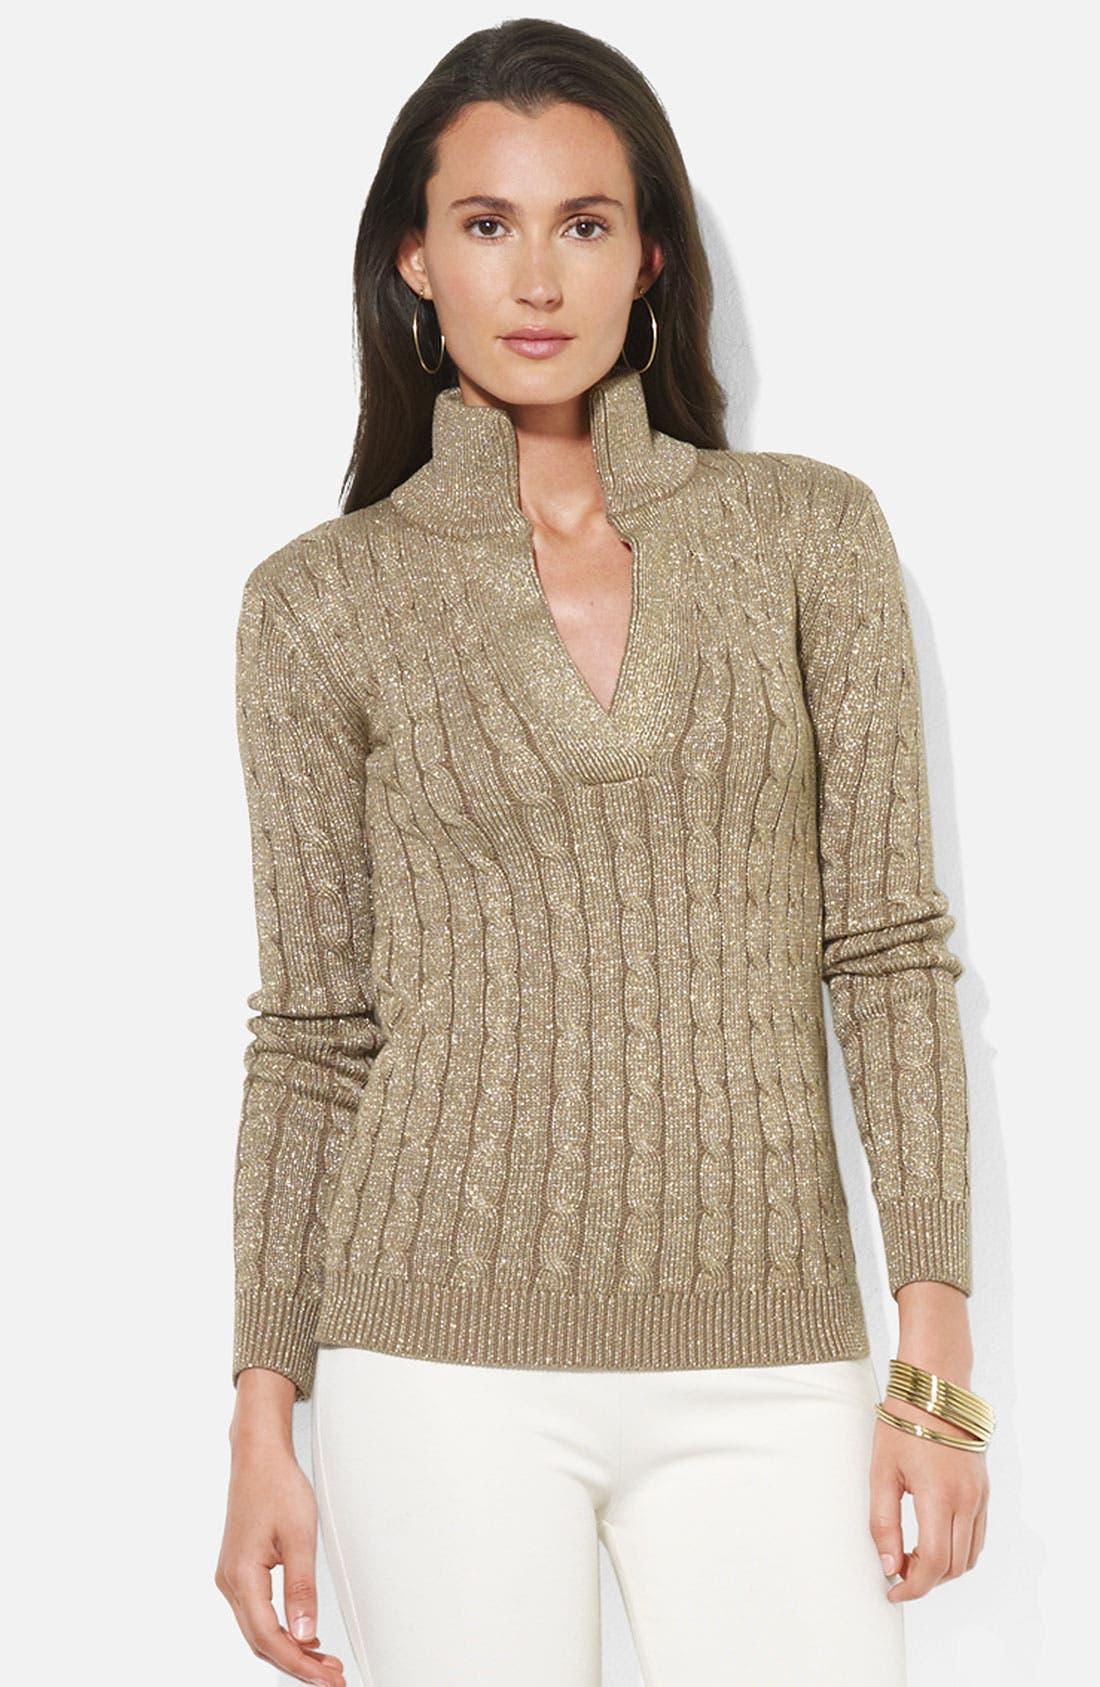 Alternate Image 1 Selected - Lauren Ralph Lauren Shimmer Cable Knit Sweater